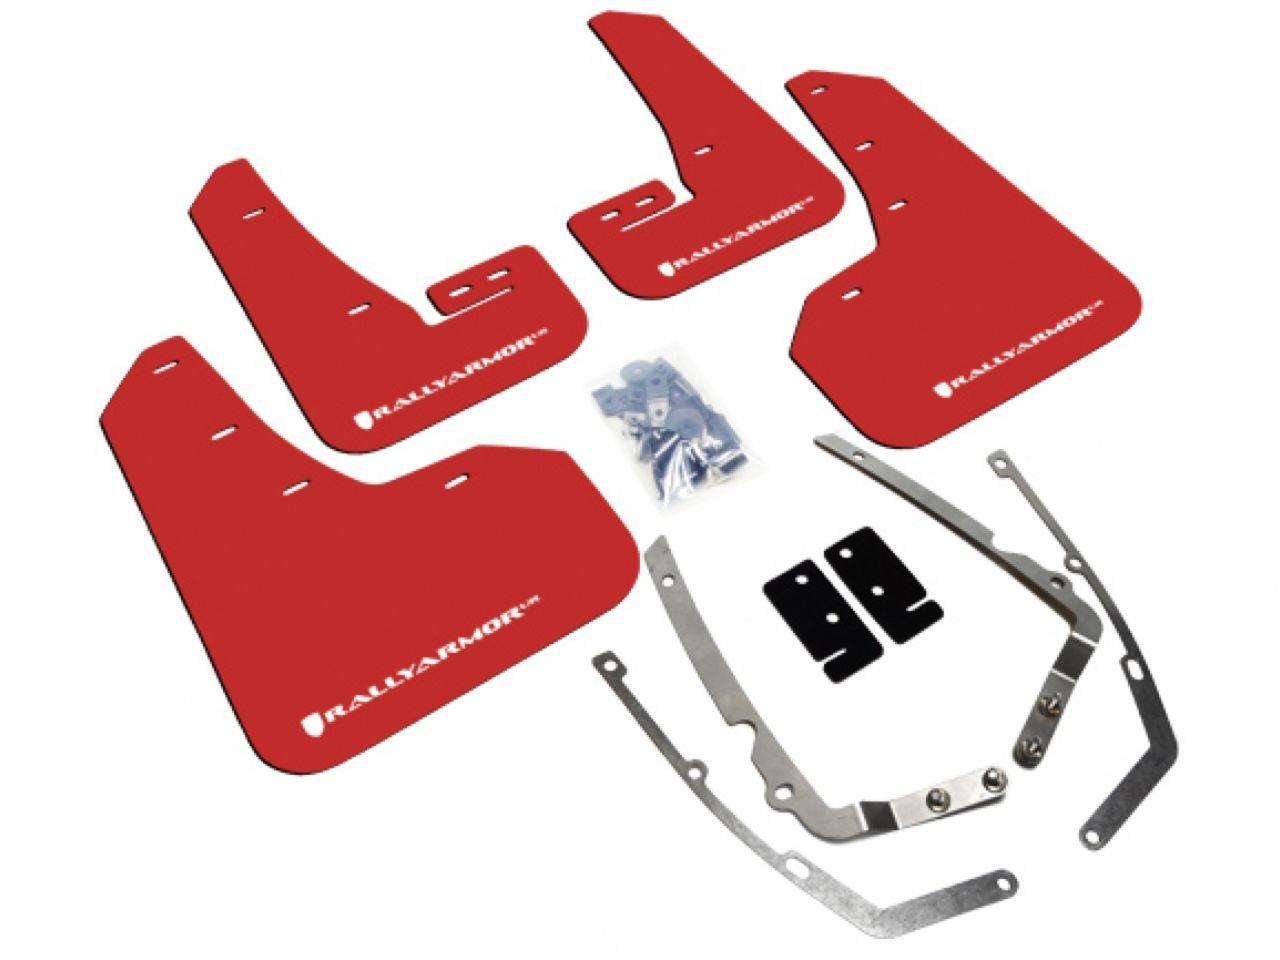 ExtendMySeat 4RUN2PRADOD Driver Side Seat-Extender Bracket